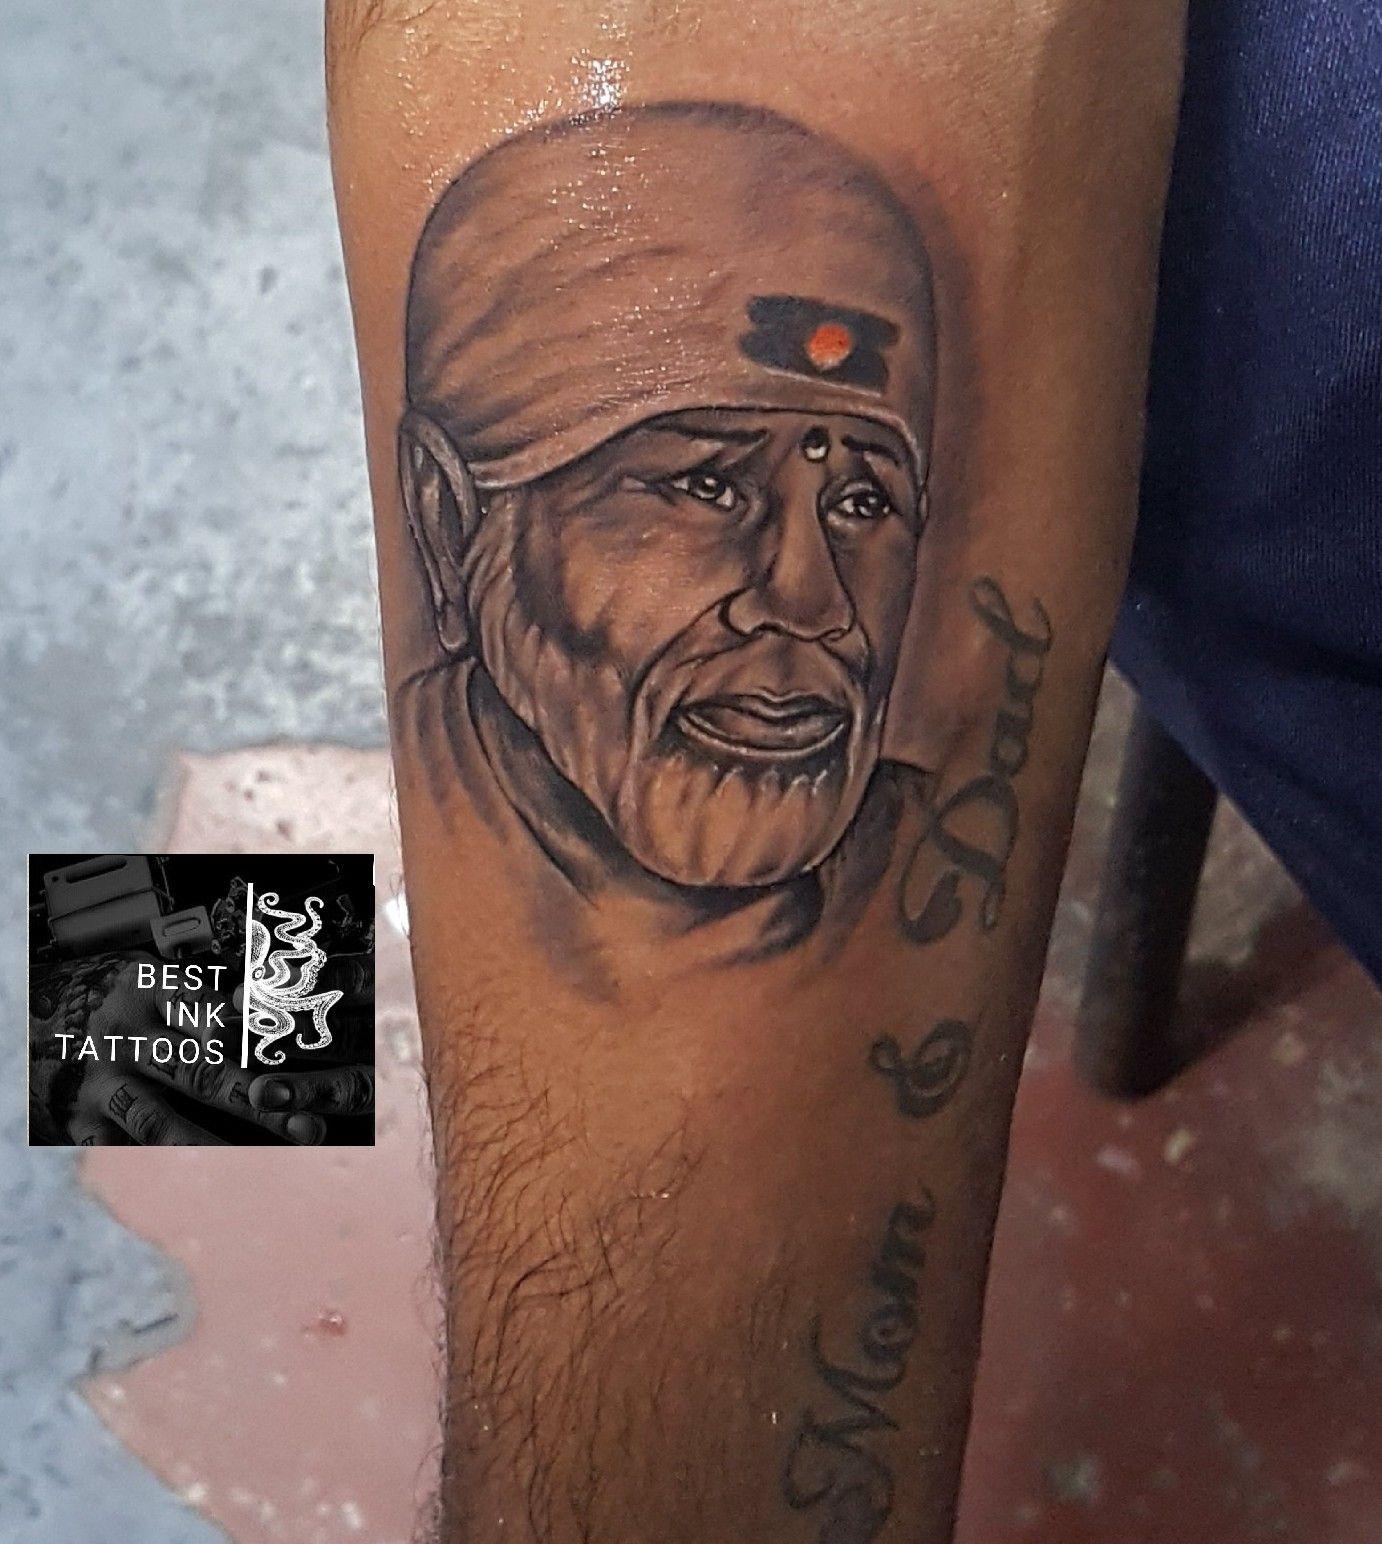 sai baba tattoo. hand tattoo artistaditya koley Bangalore